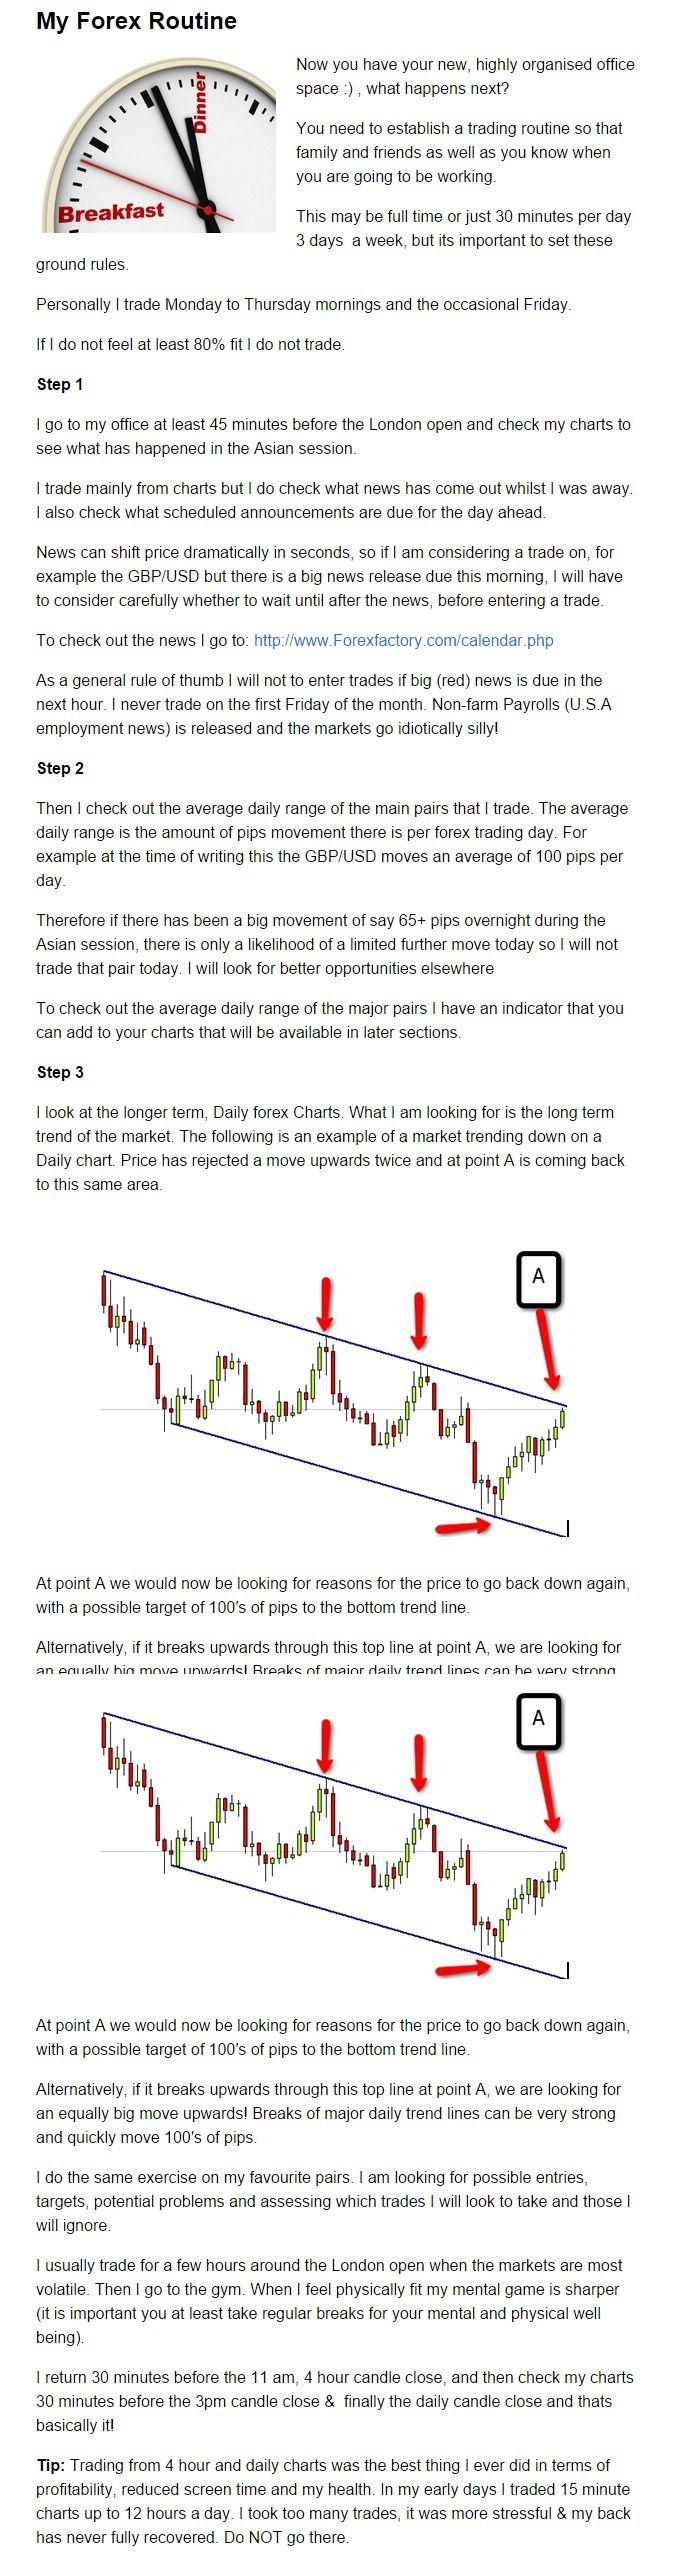 My Forex Routine Forex Routine Trading Trade Finance